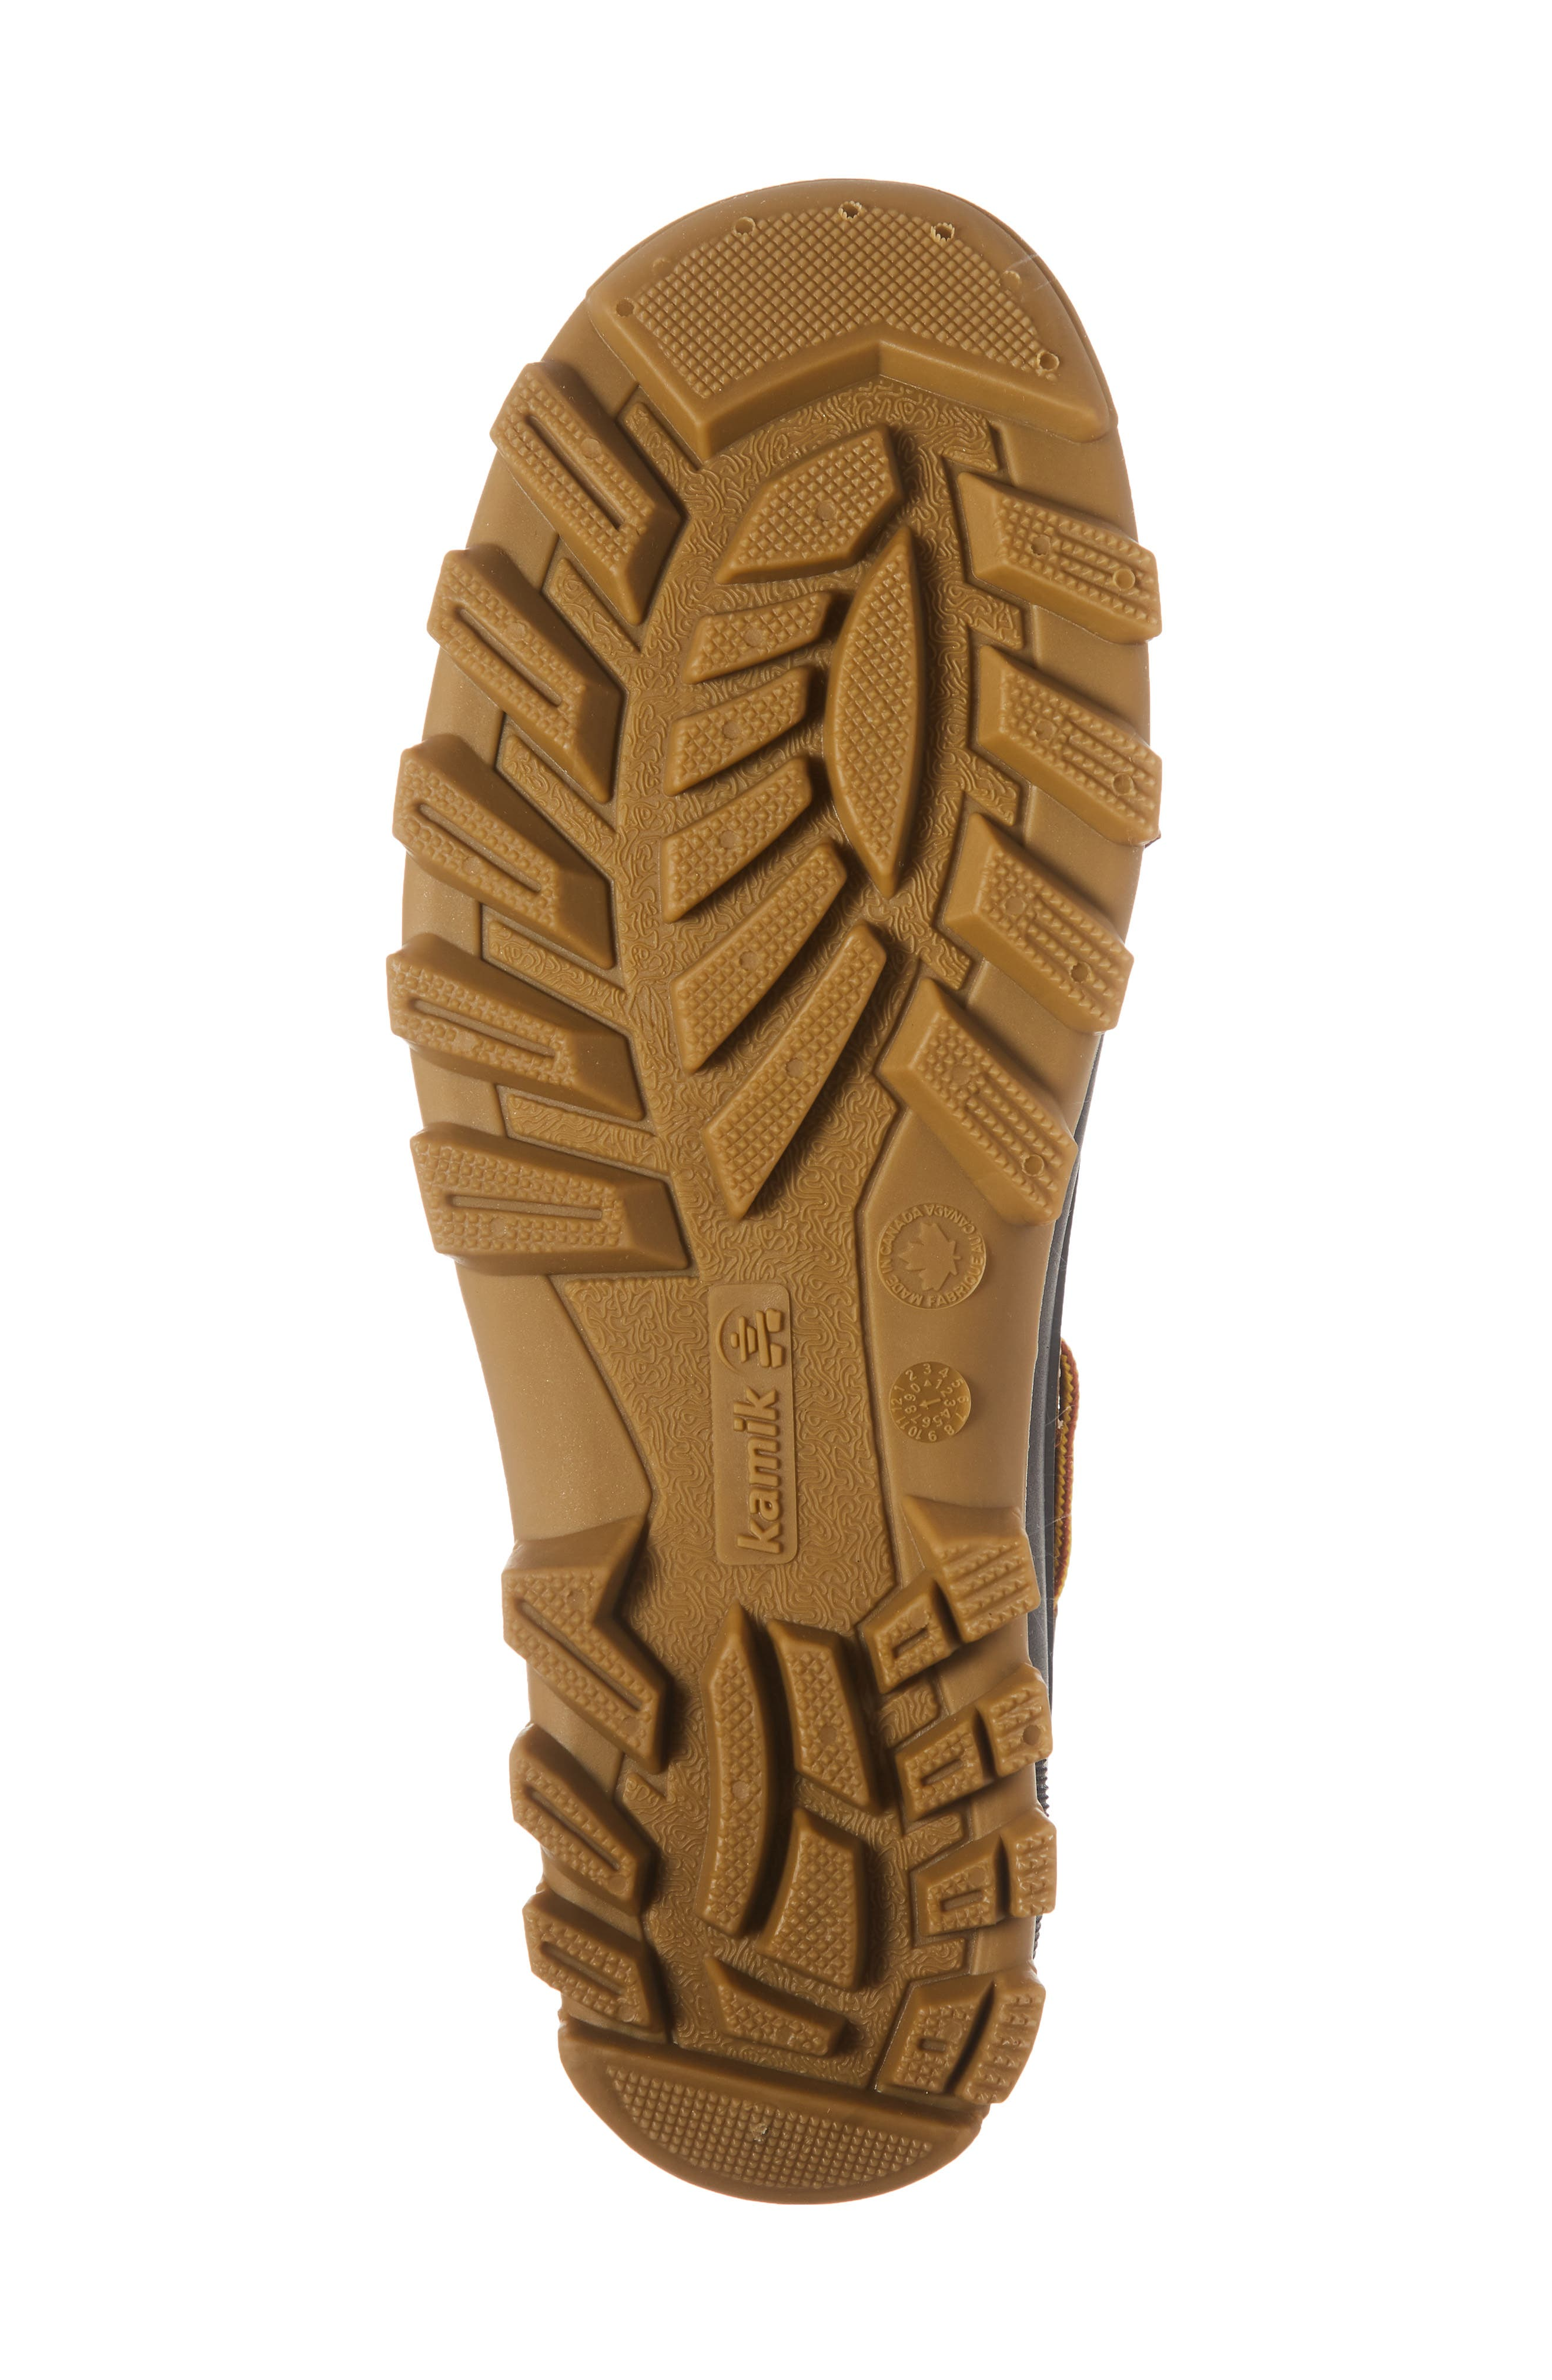 Yukon Short Waterproof Boot,                             Alternate thumbnail 6, color,                             TAN LEATHER